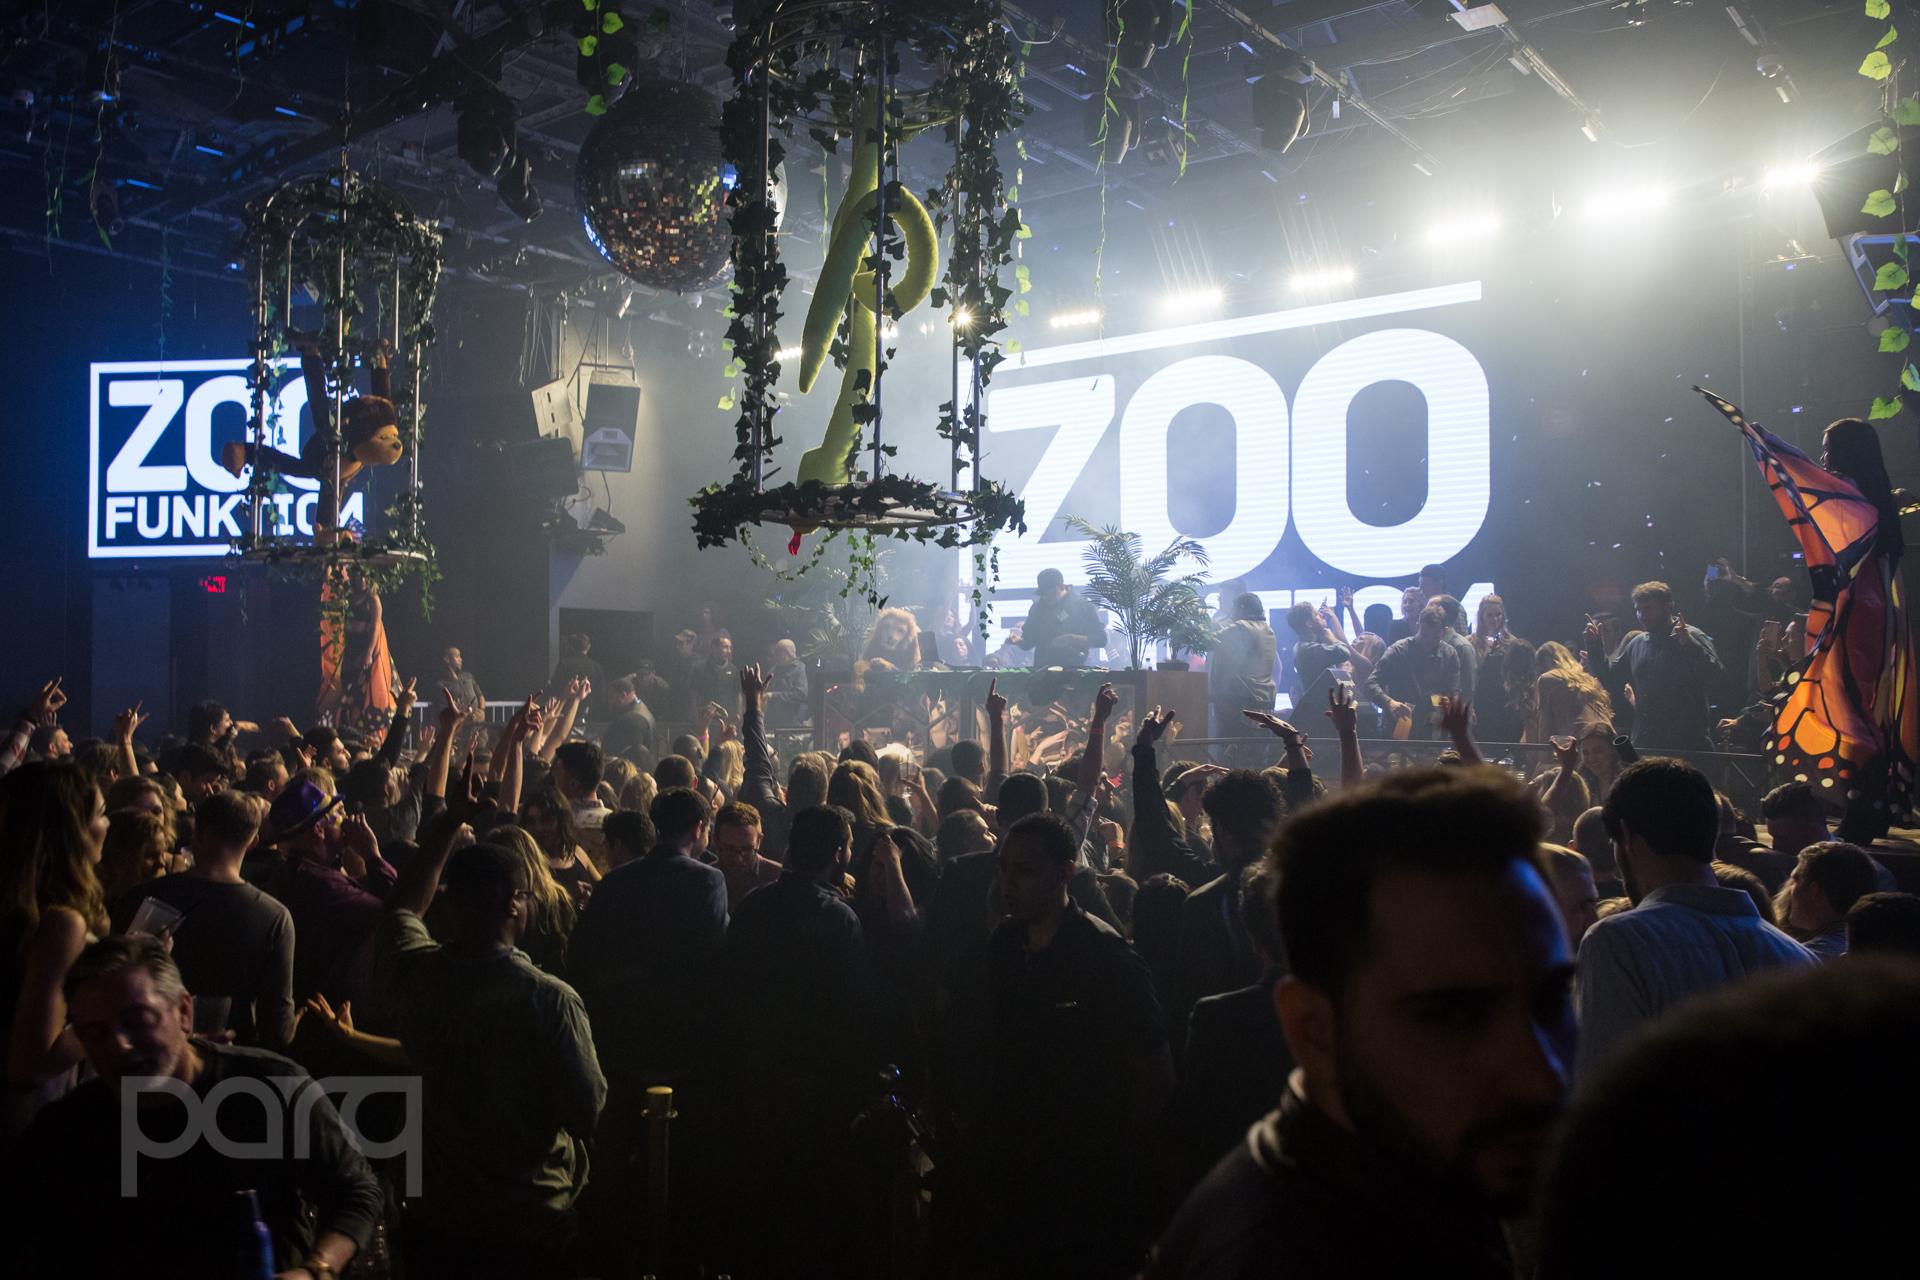 San-Diego-Nightclub-Zoo Funktion-28.jpg